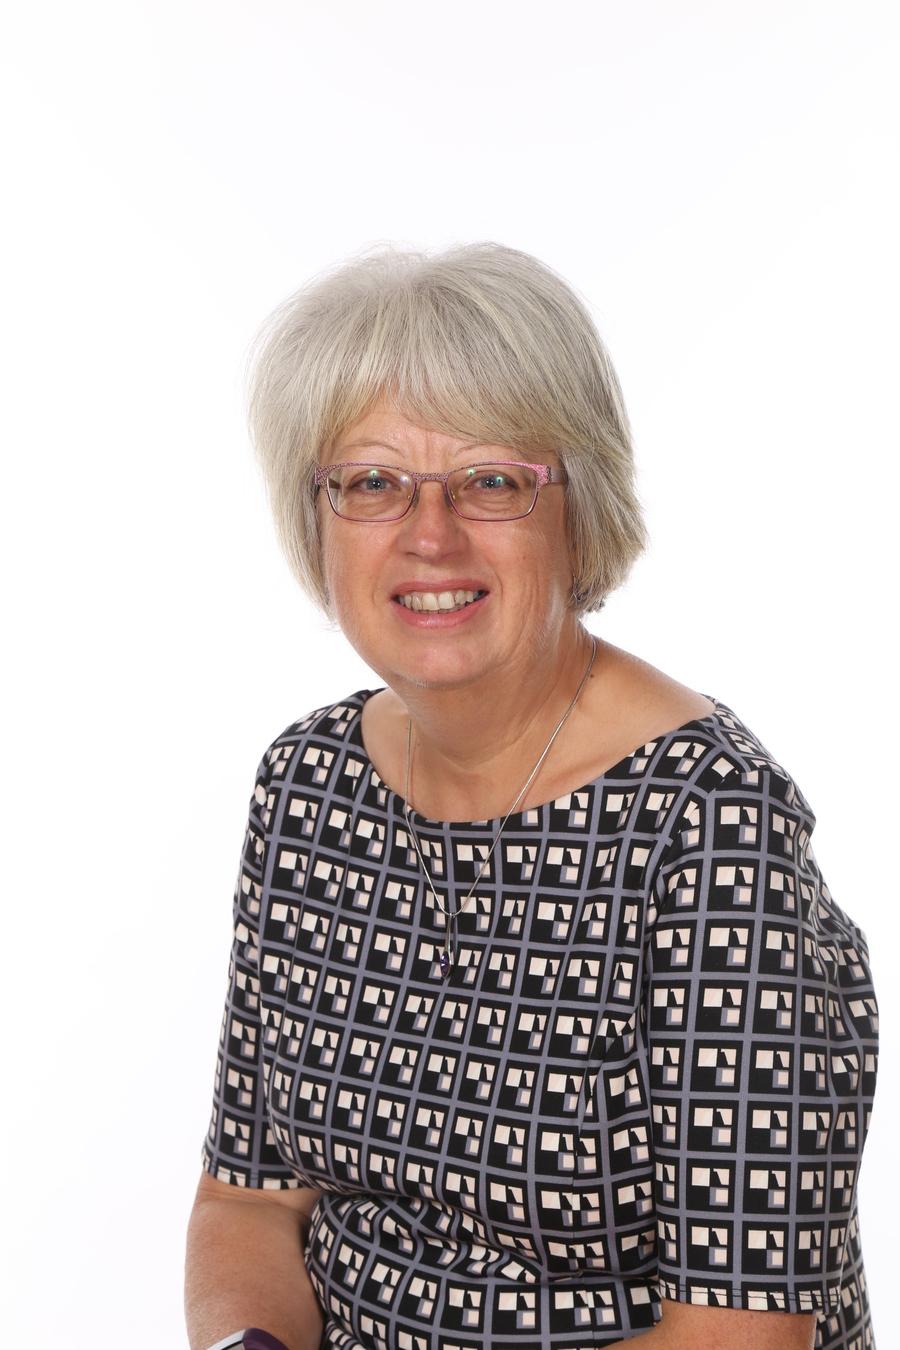 Mrs Dalton